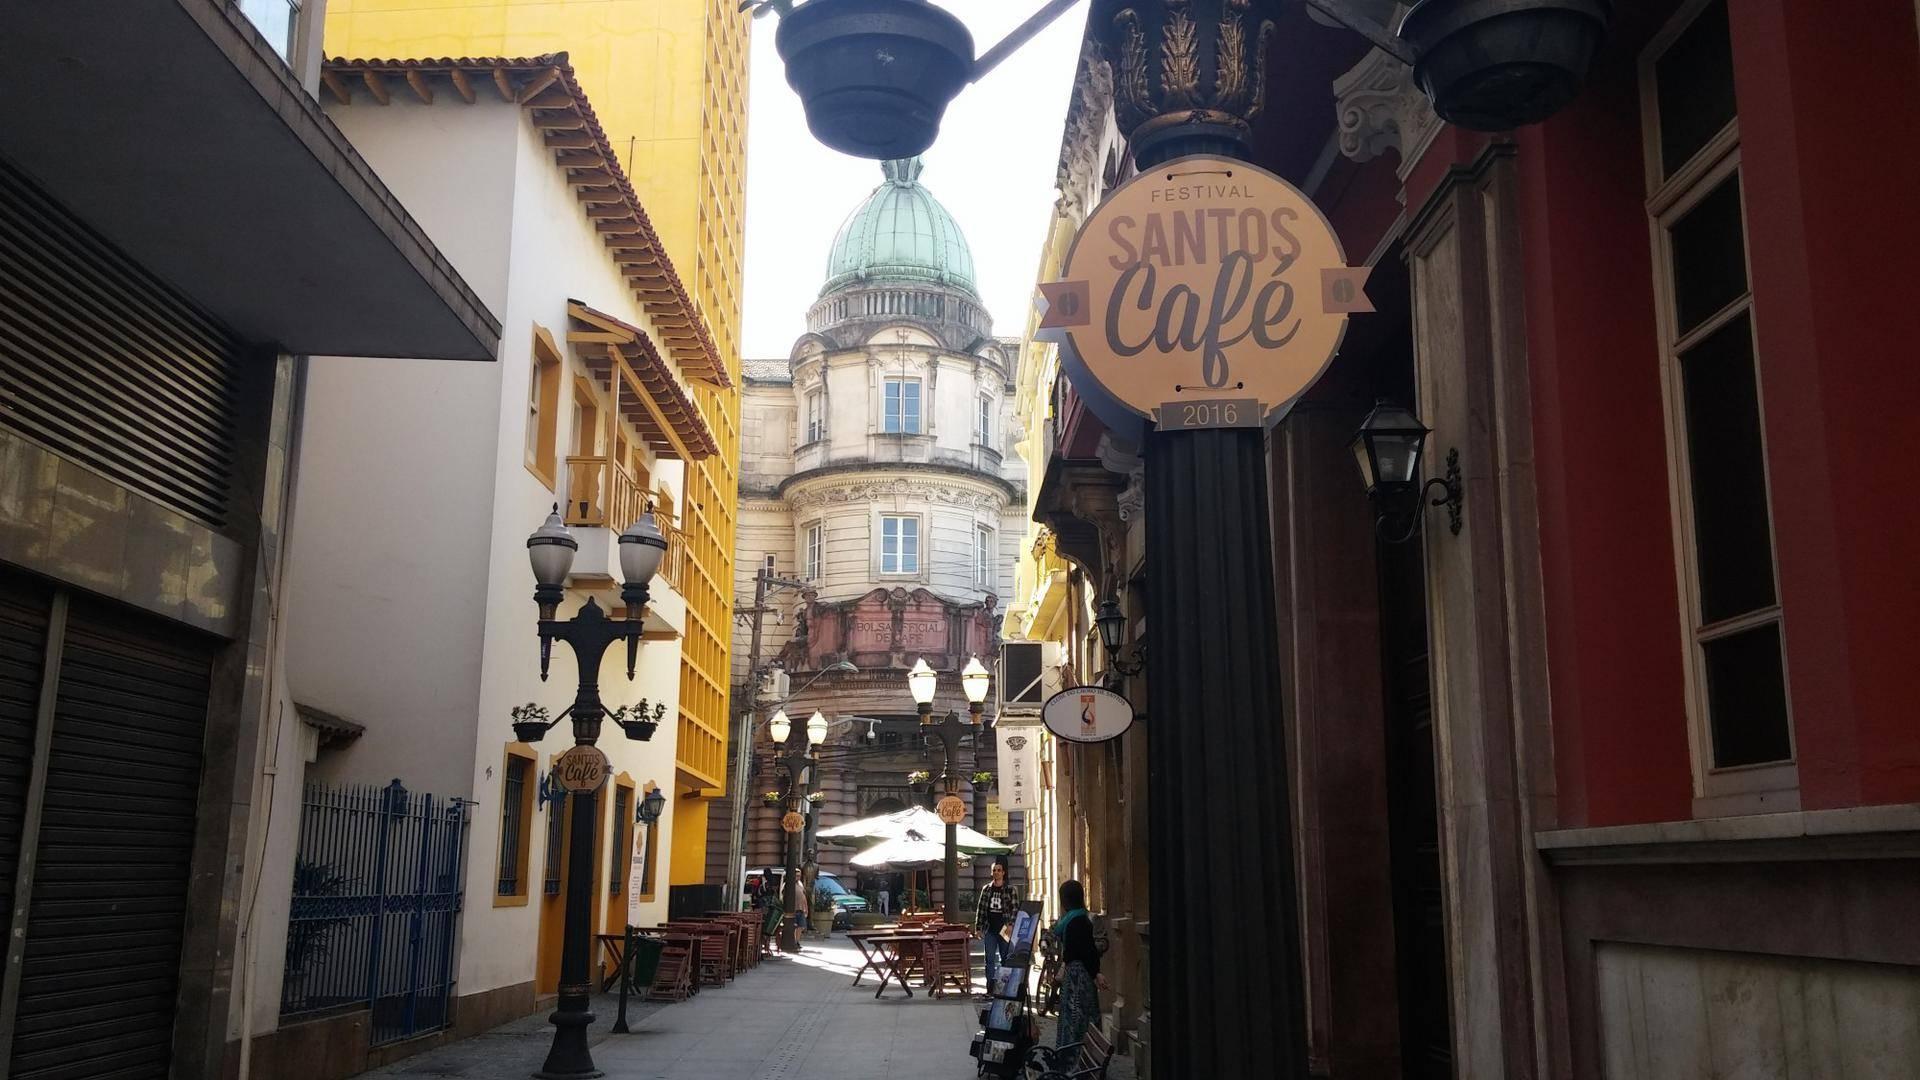 www.juicysantos.com.br - festival santos café